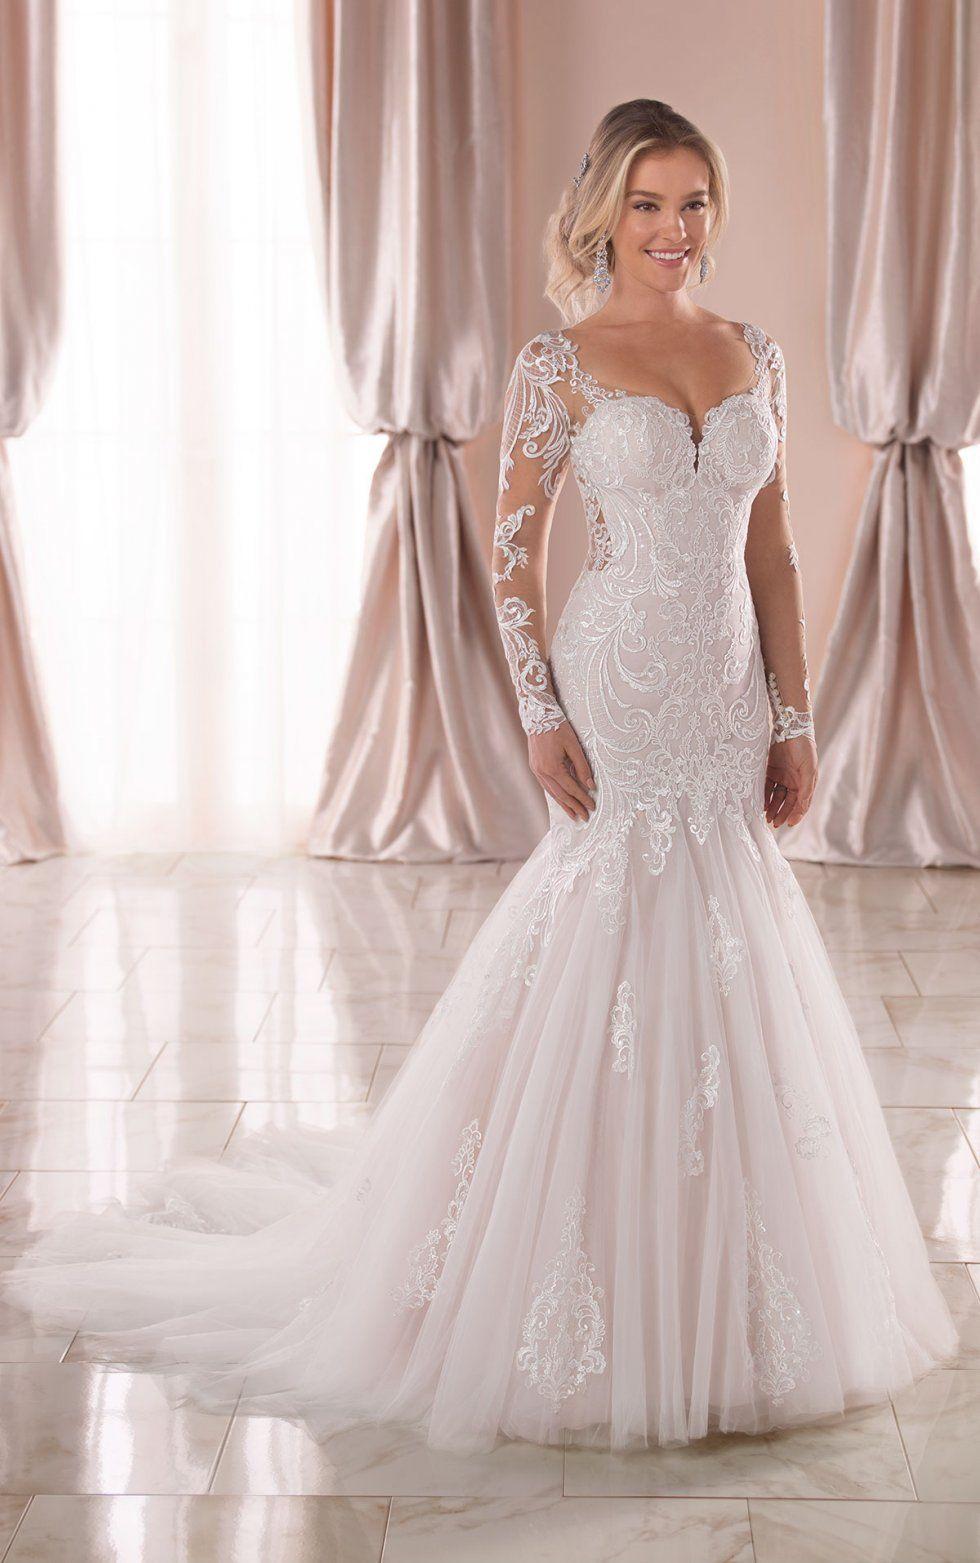 Long Sleeved Lace Trumpet Wedding Dress Stella York Wedding Dresses Trumpet Wedding Dress Lace Drop Waist Wedding Dress Trumpet Wedding Dress [ 1563 x 980 Pixel ]